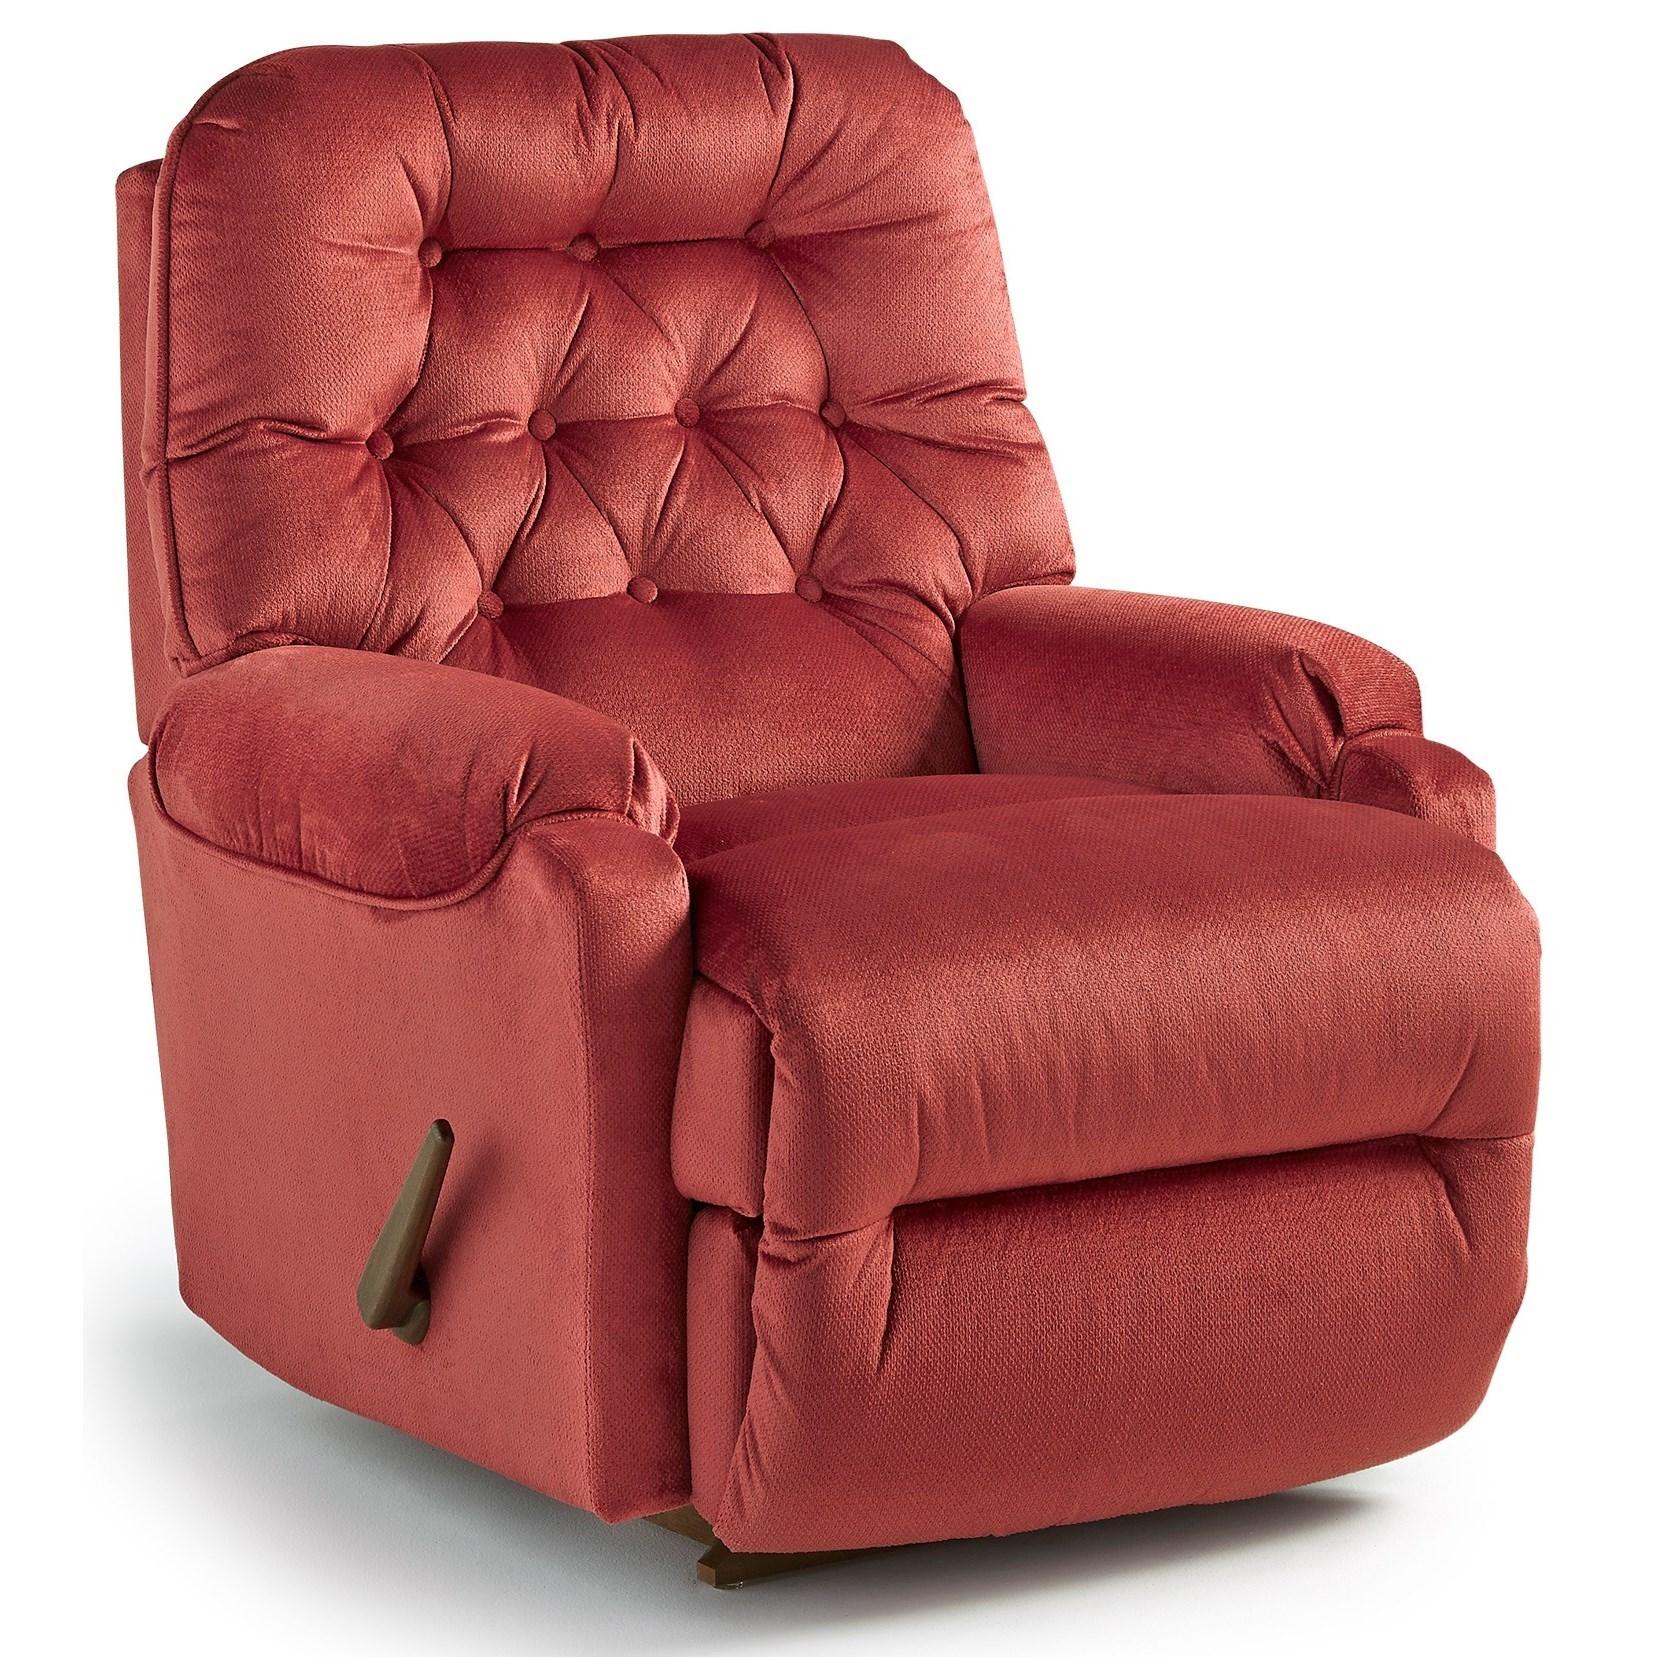 Best Home Furnishings Recliners - Petite Brena Rocker Recliner - Item Number: 9AW27